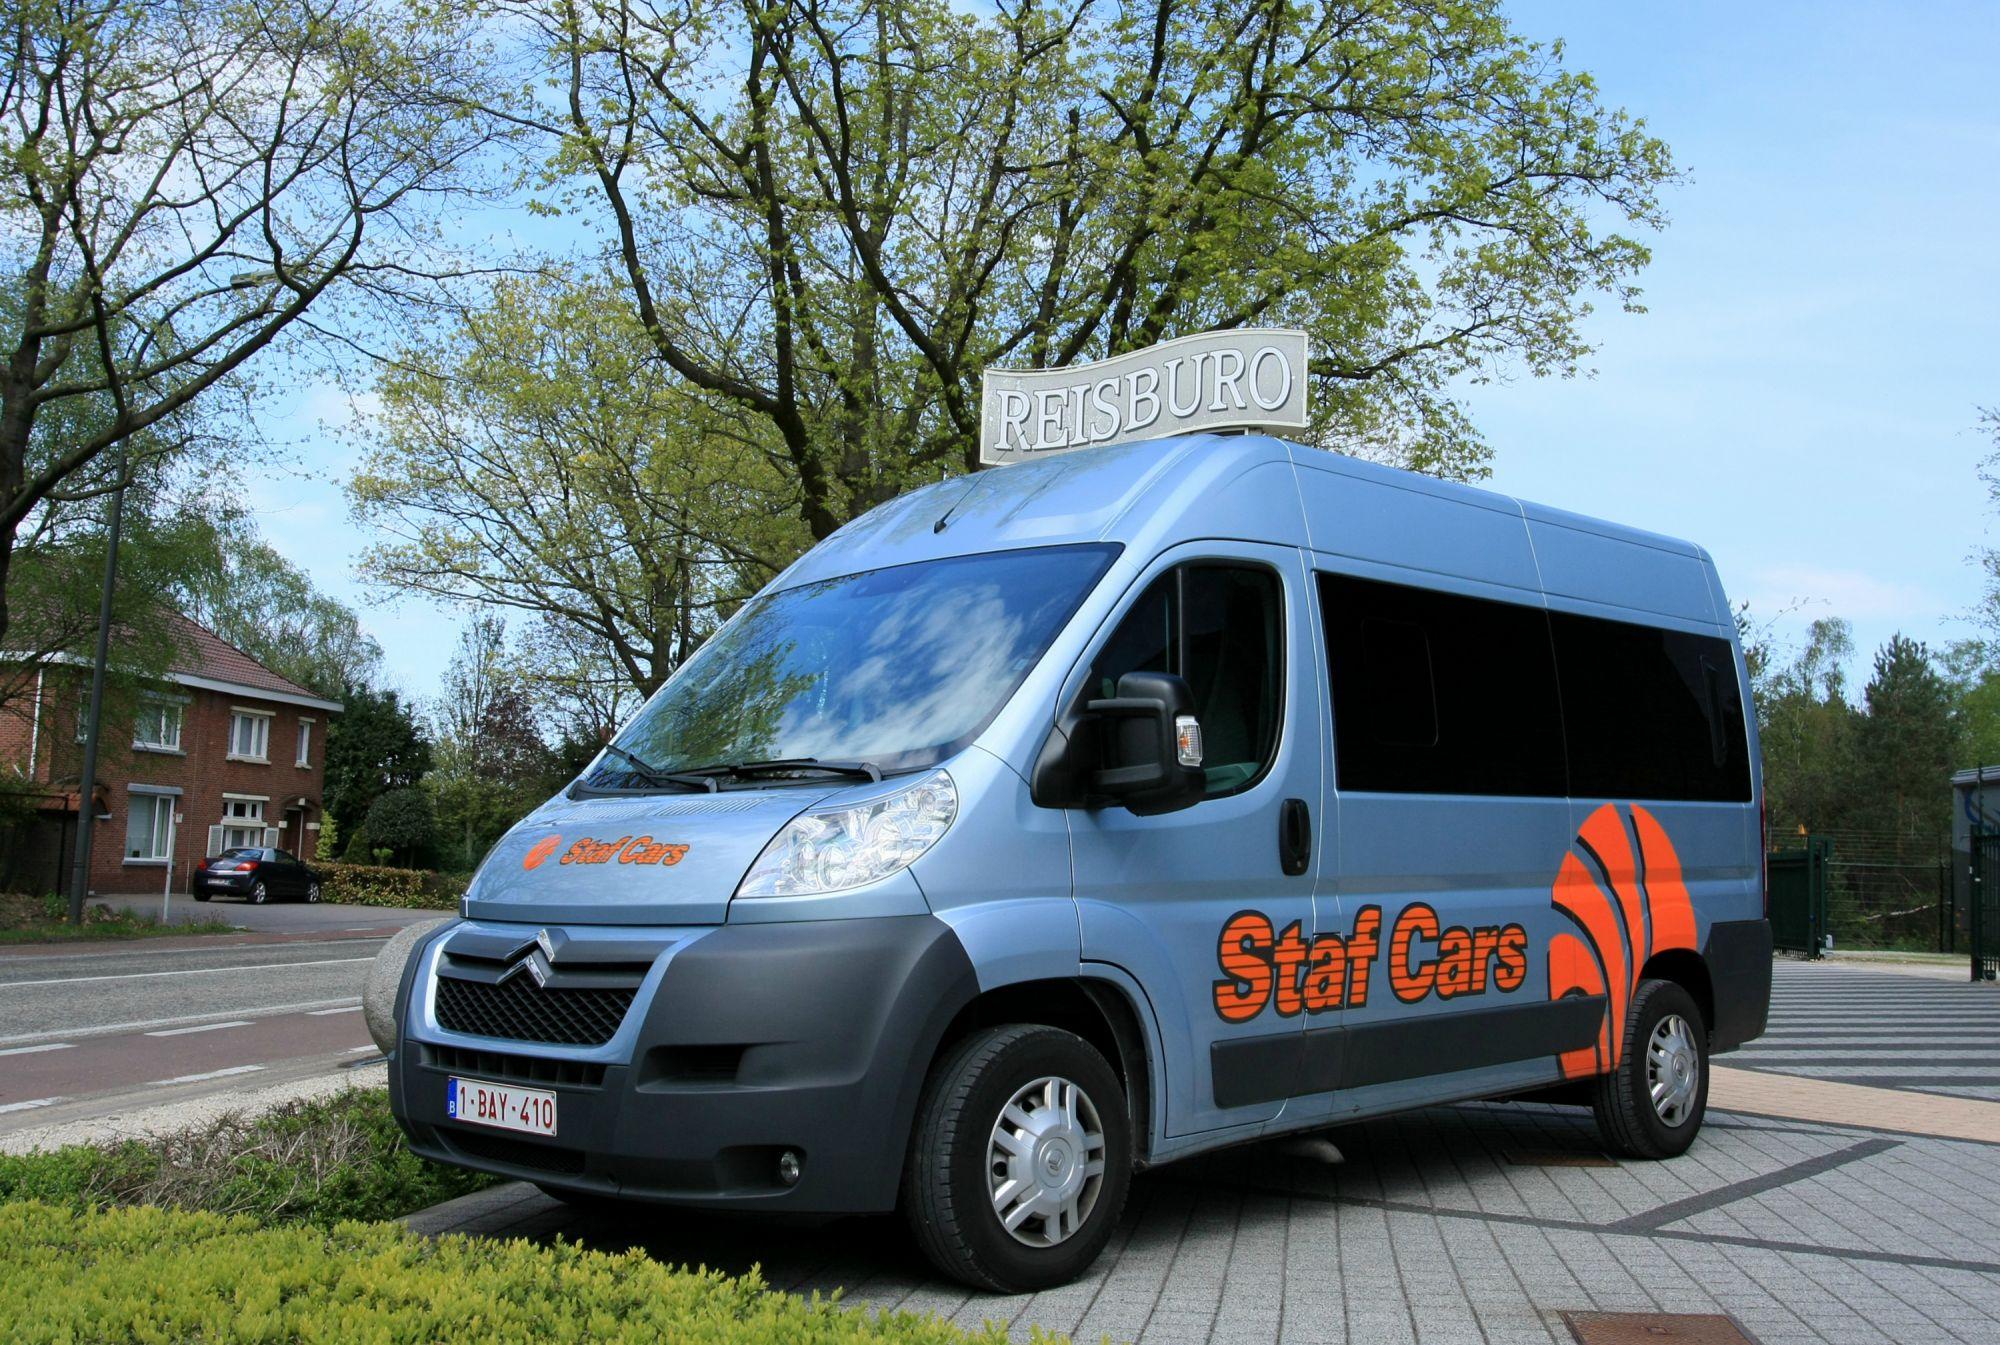 Citroen-mini-bus-(2)